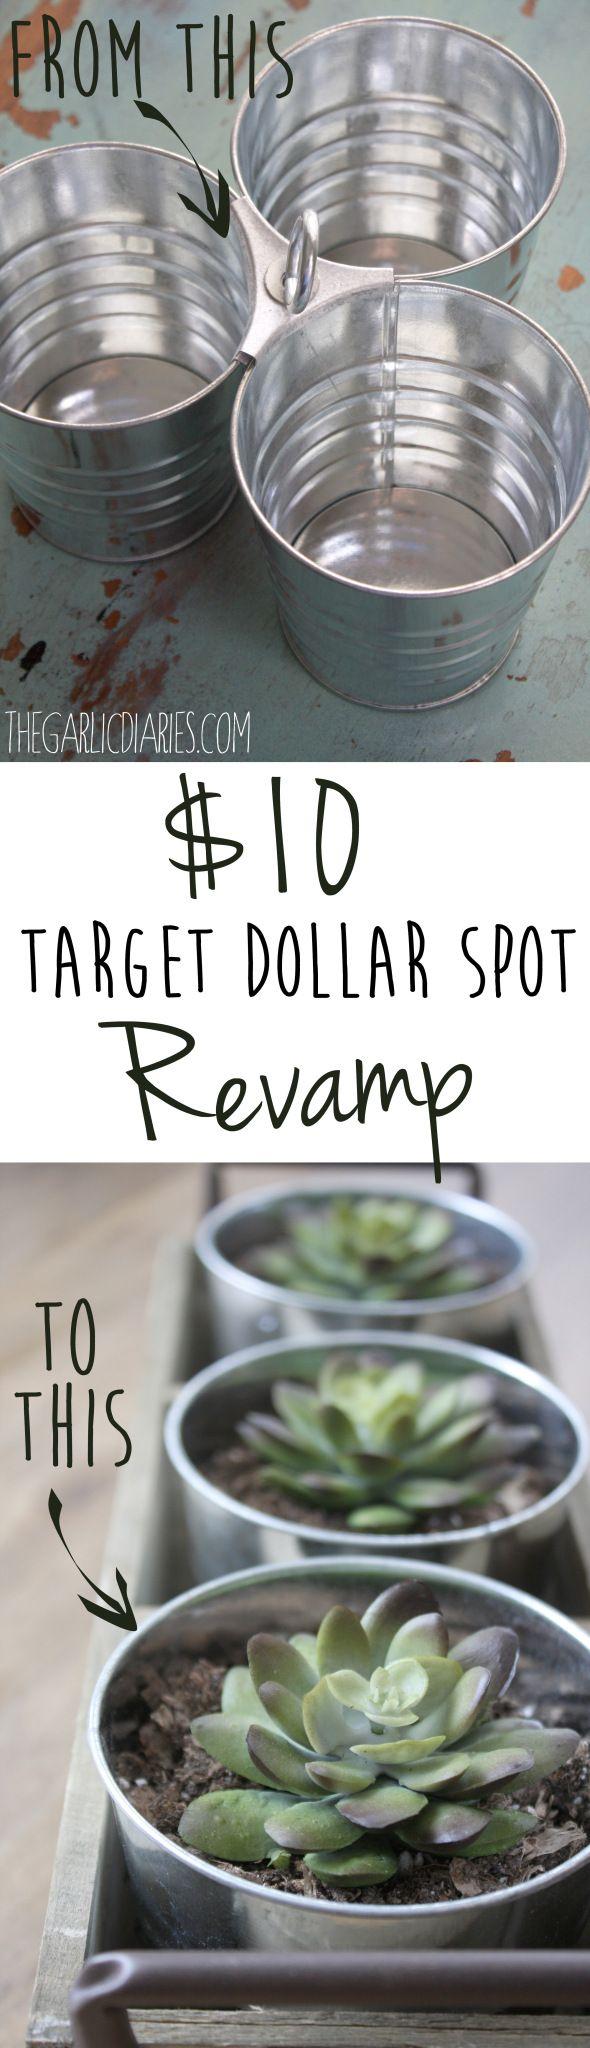 $10 Target Dollar Spot Revamp -- TheGarlicDiaries.com